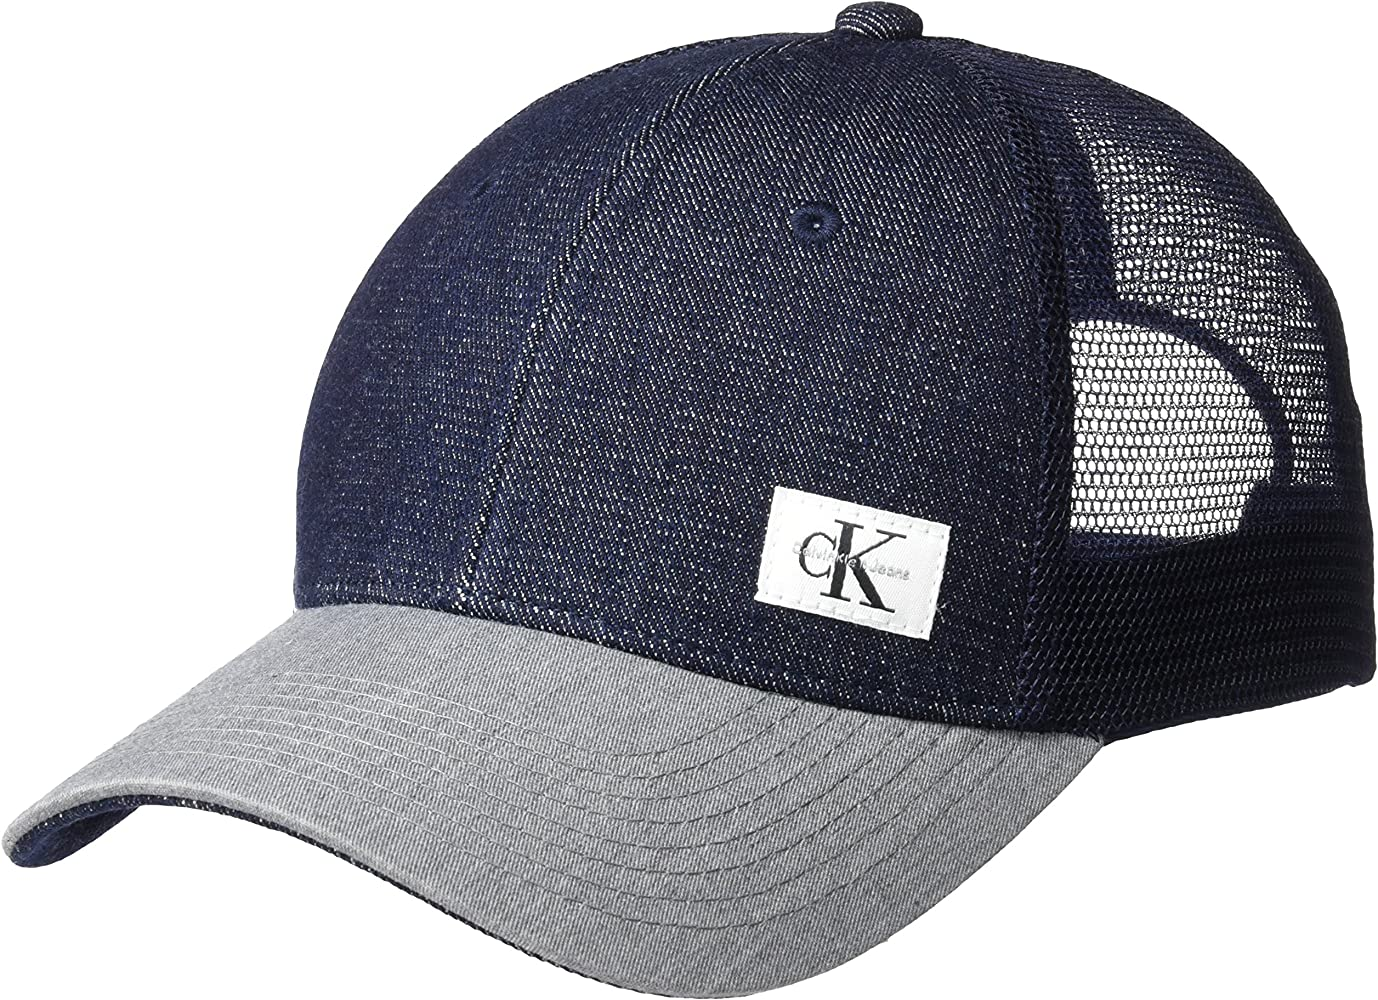 Calvin Klein Trucker - Sombreros Y Gorras - One Size Hombres ...